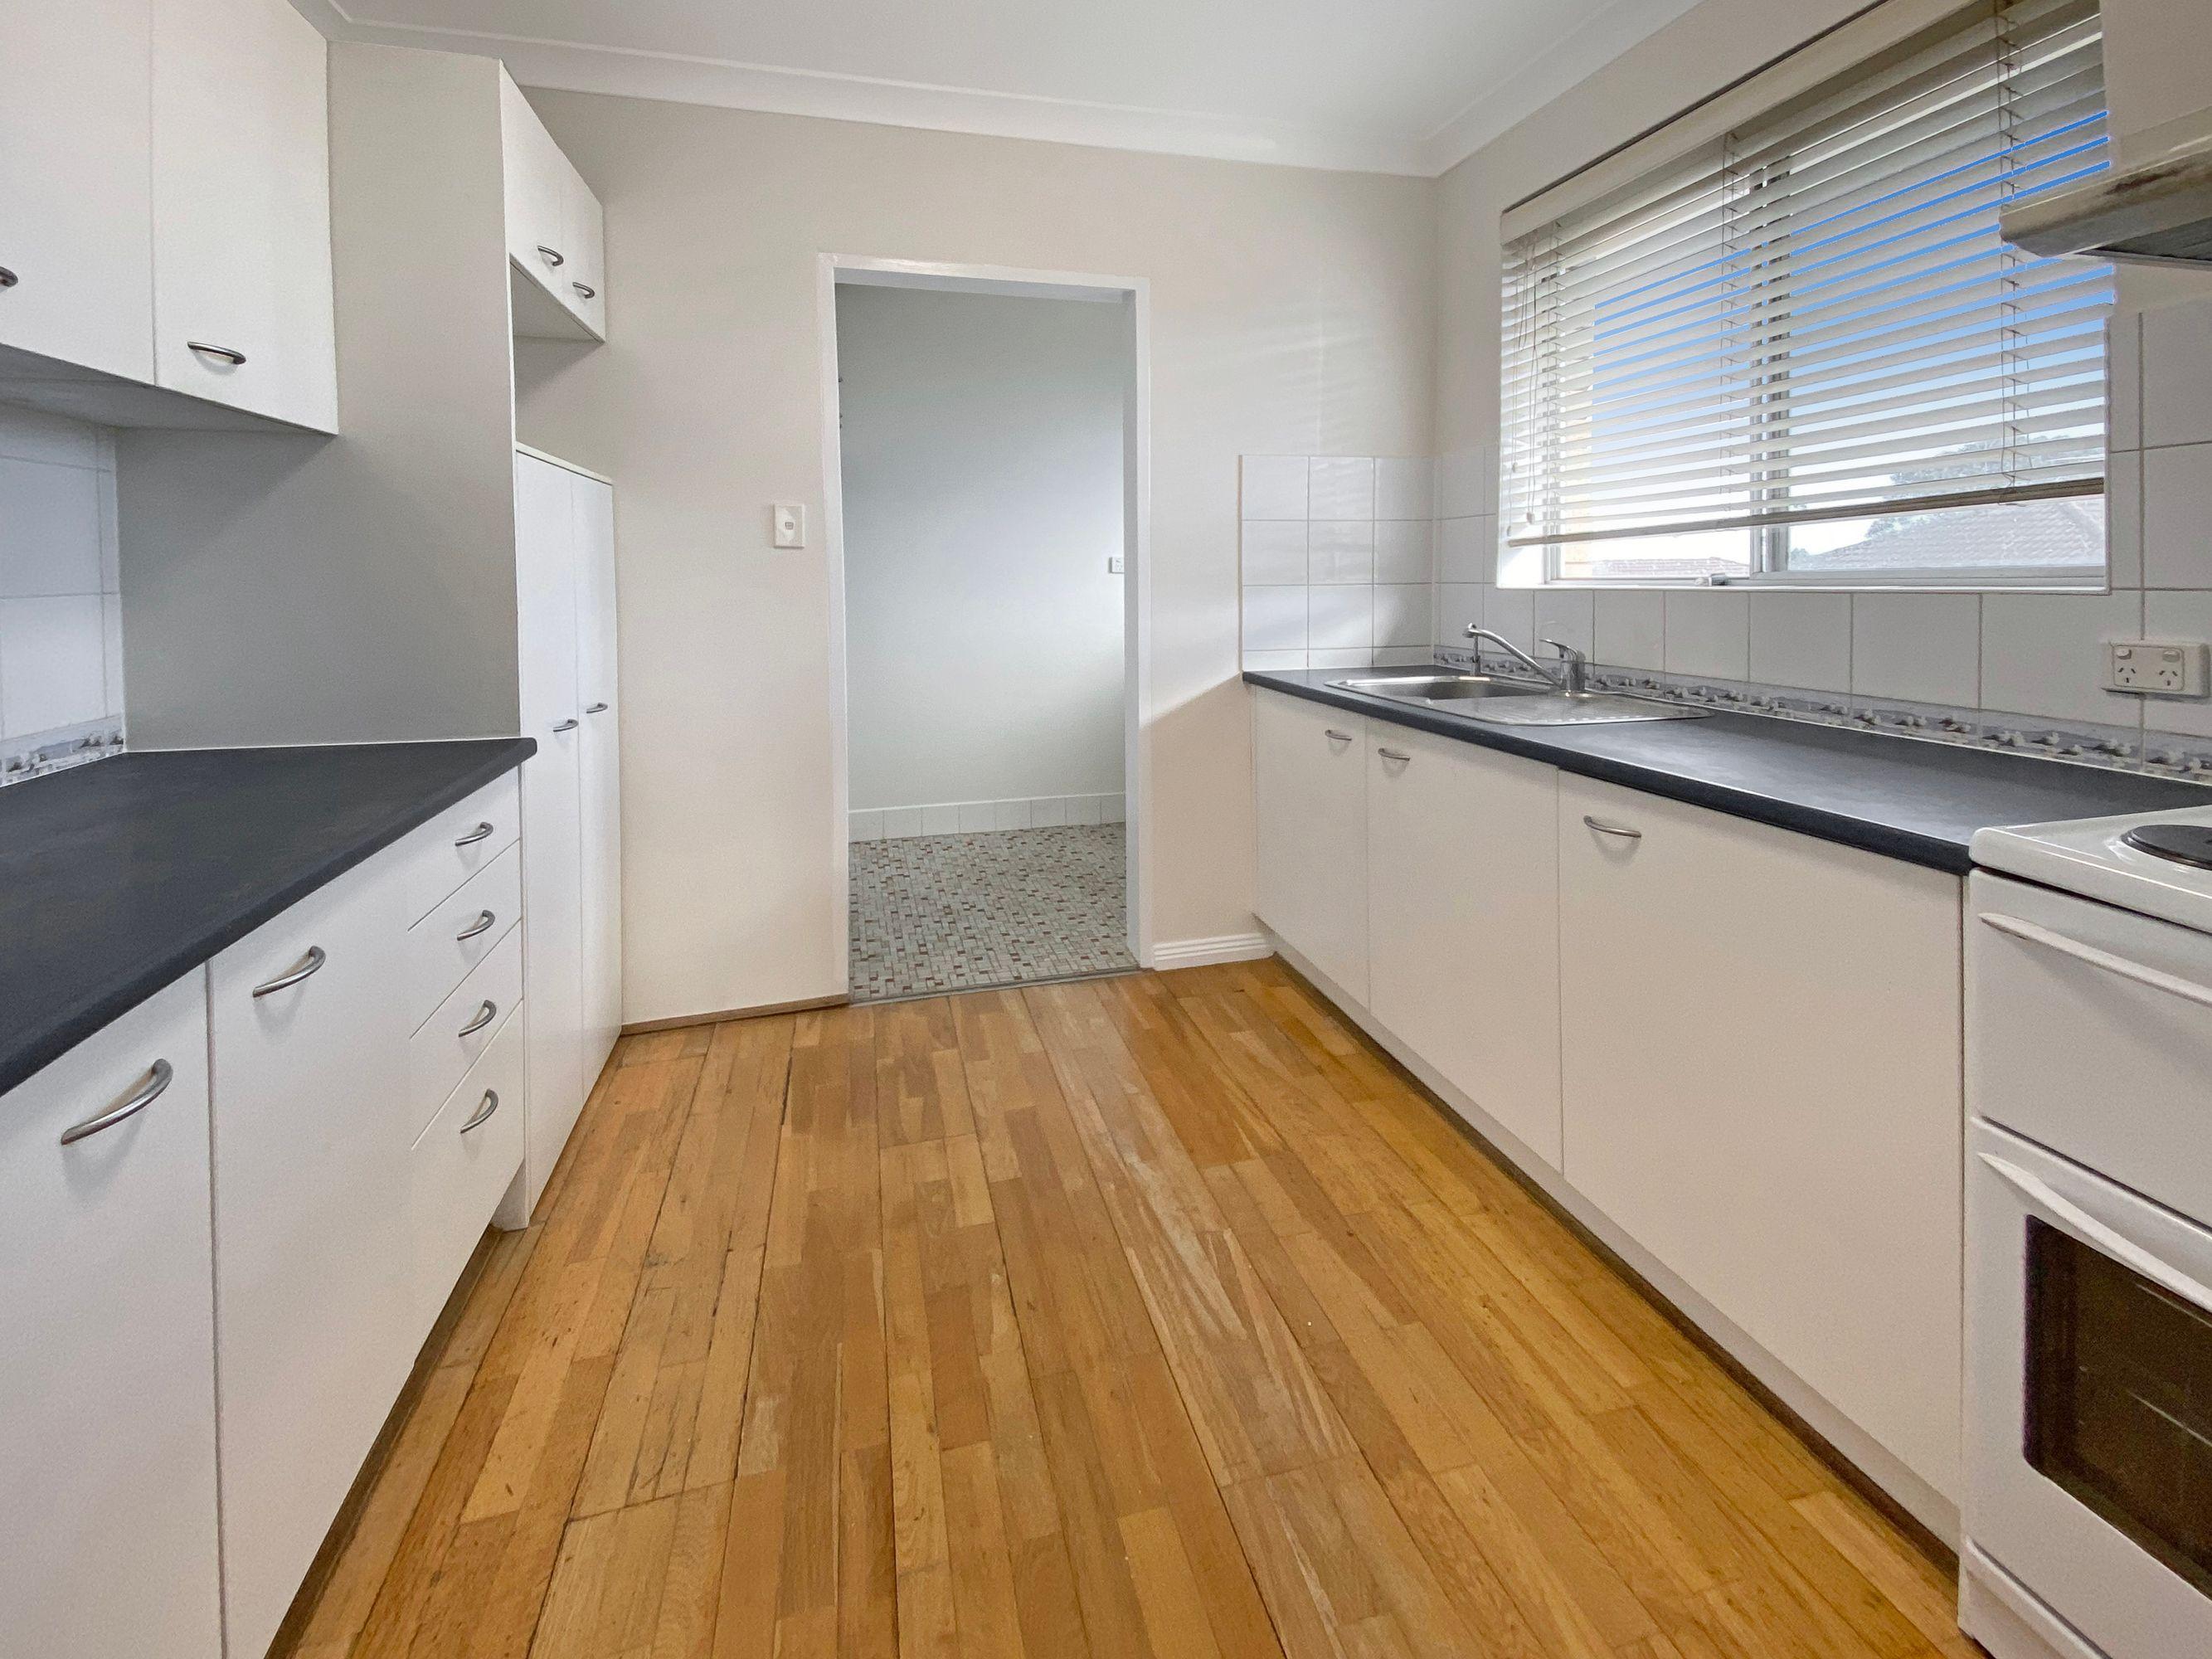 12/15 Ashburn Place, Gladesville, NSW 2111